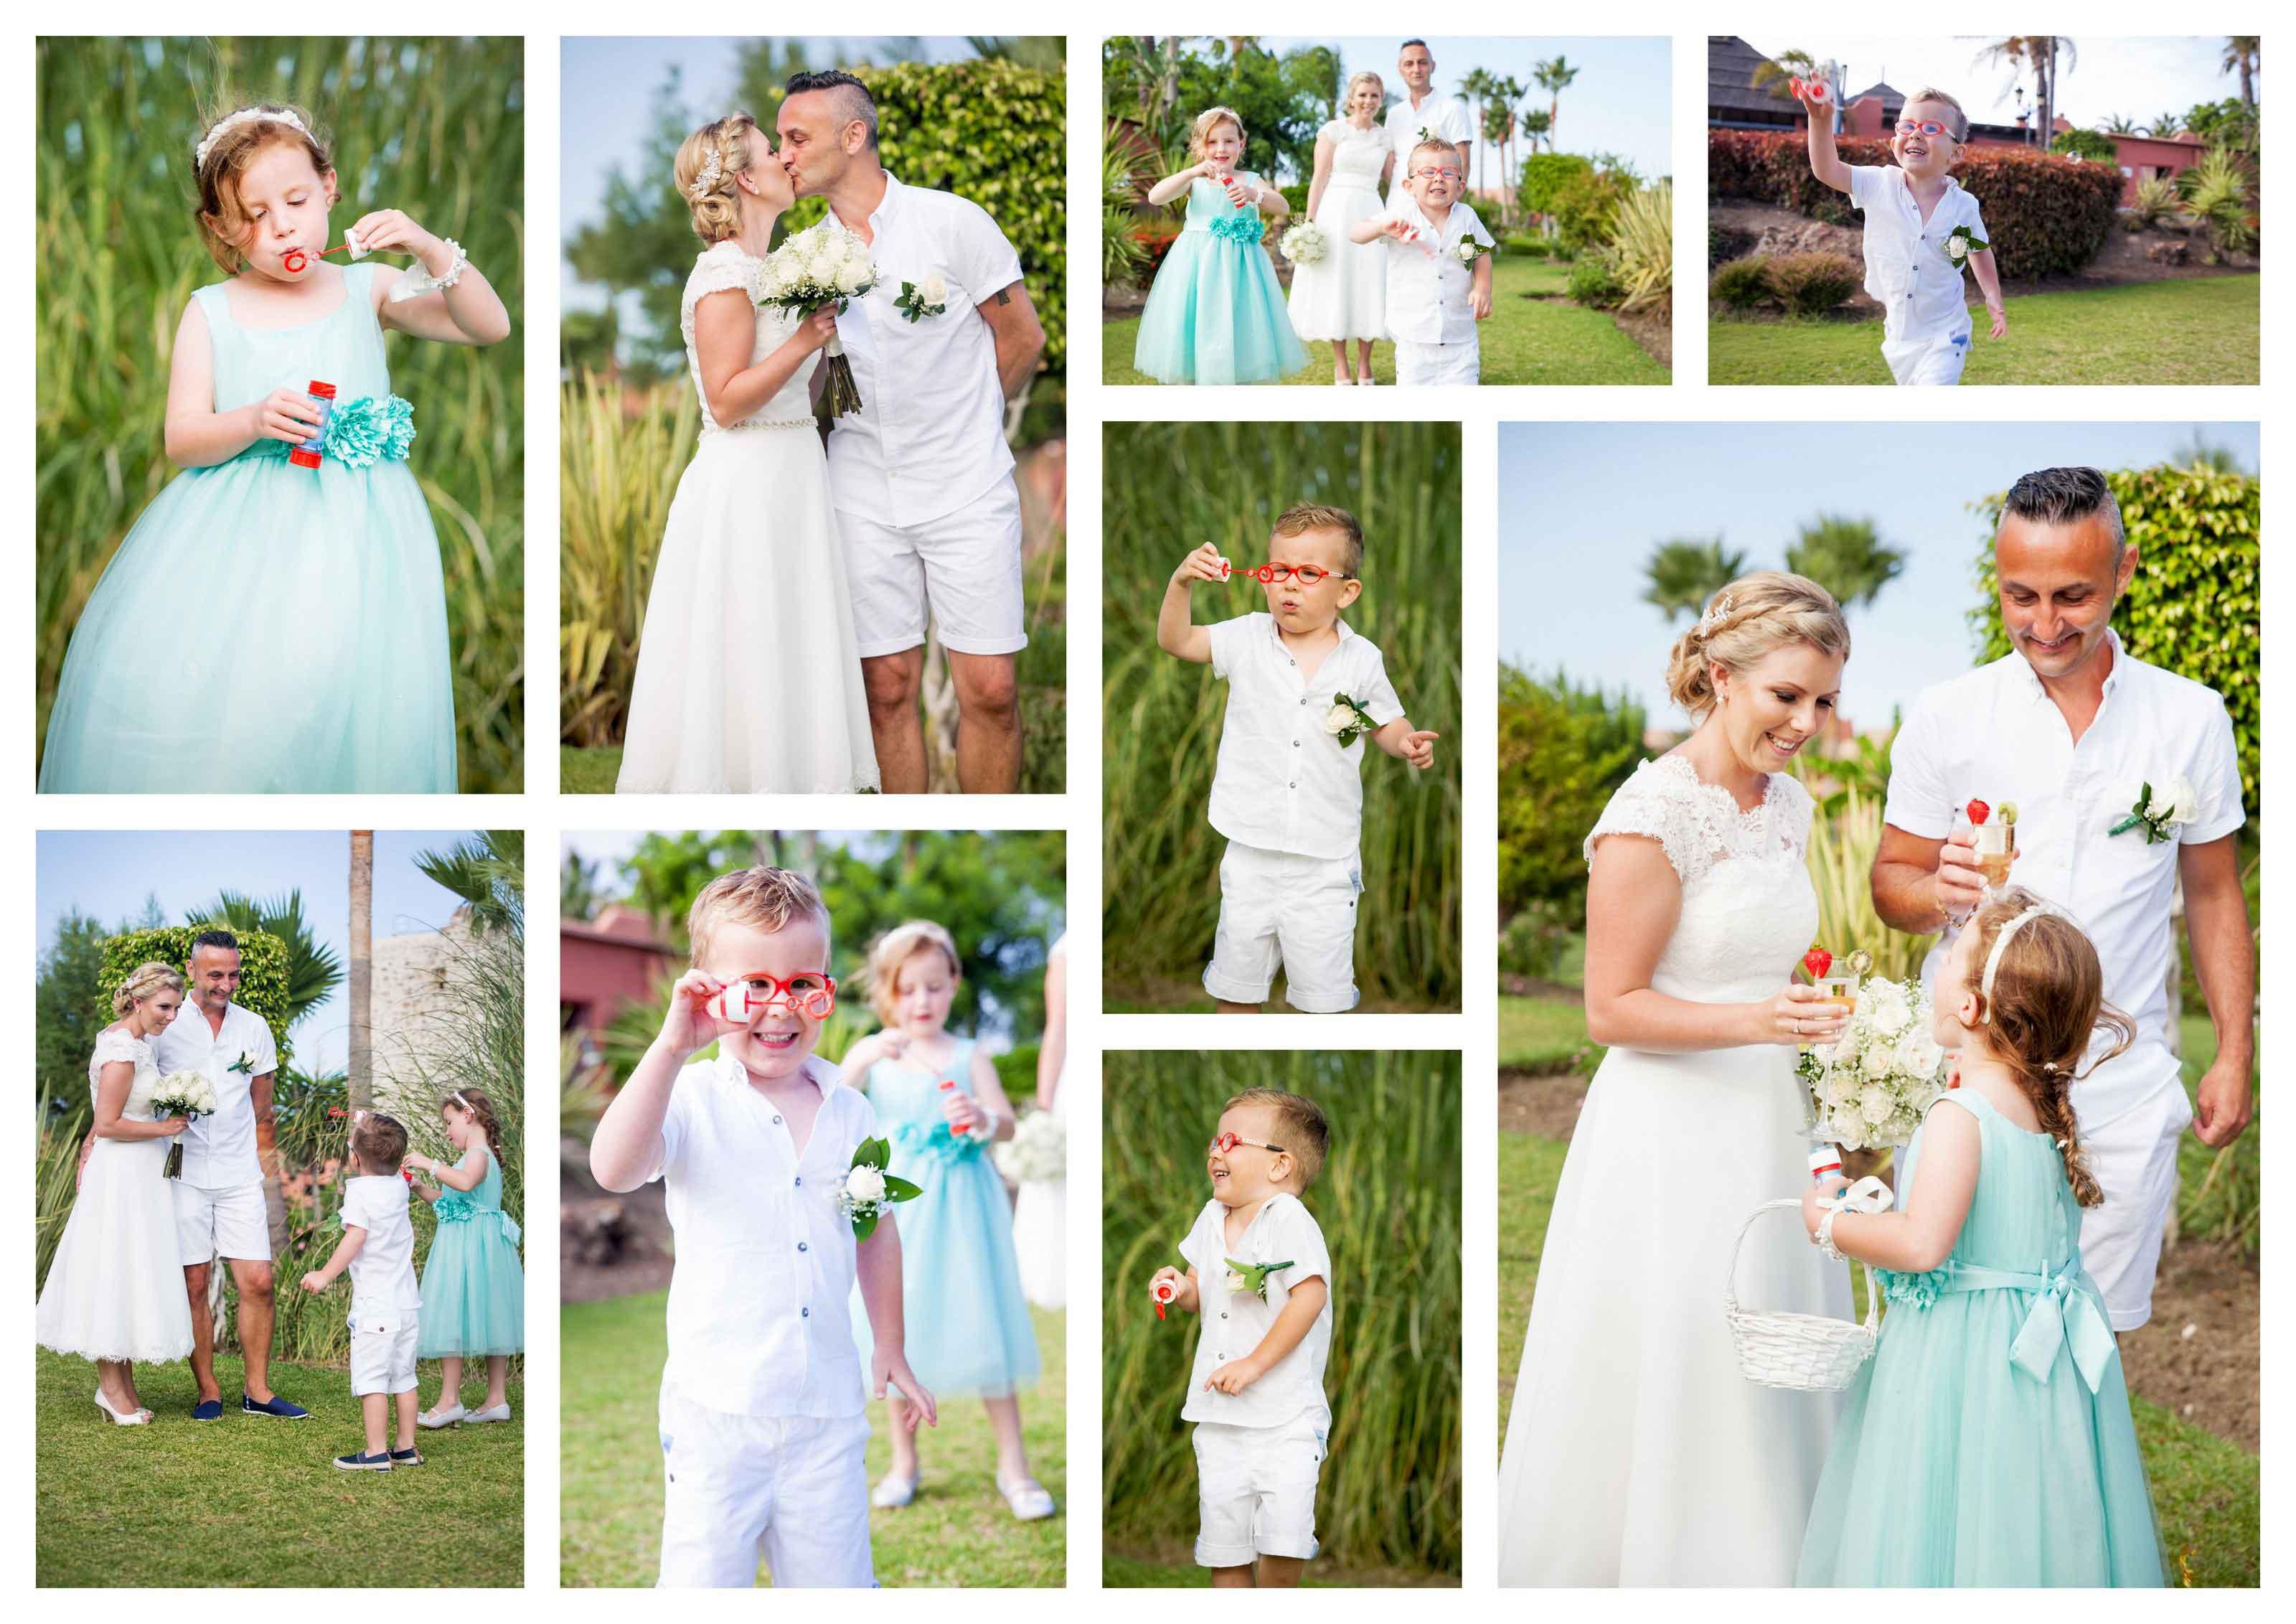 wedding marbella photography